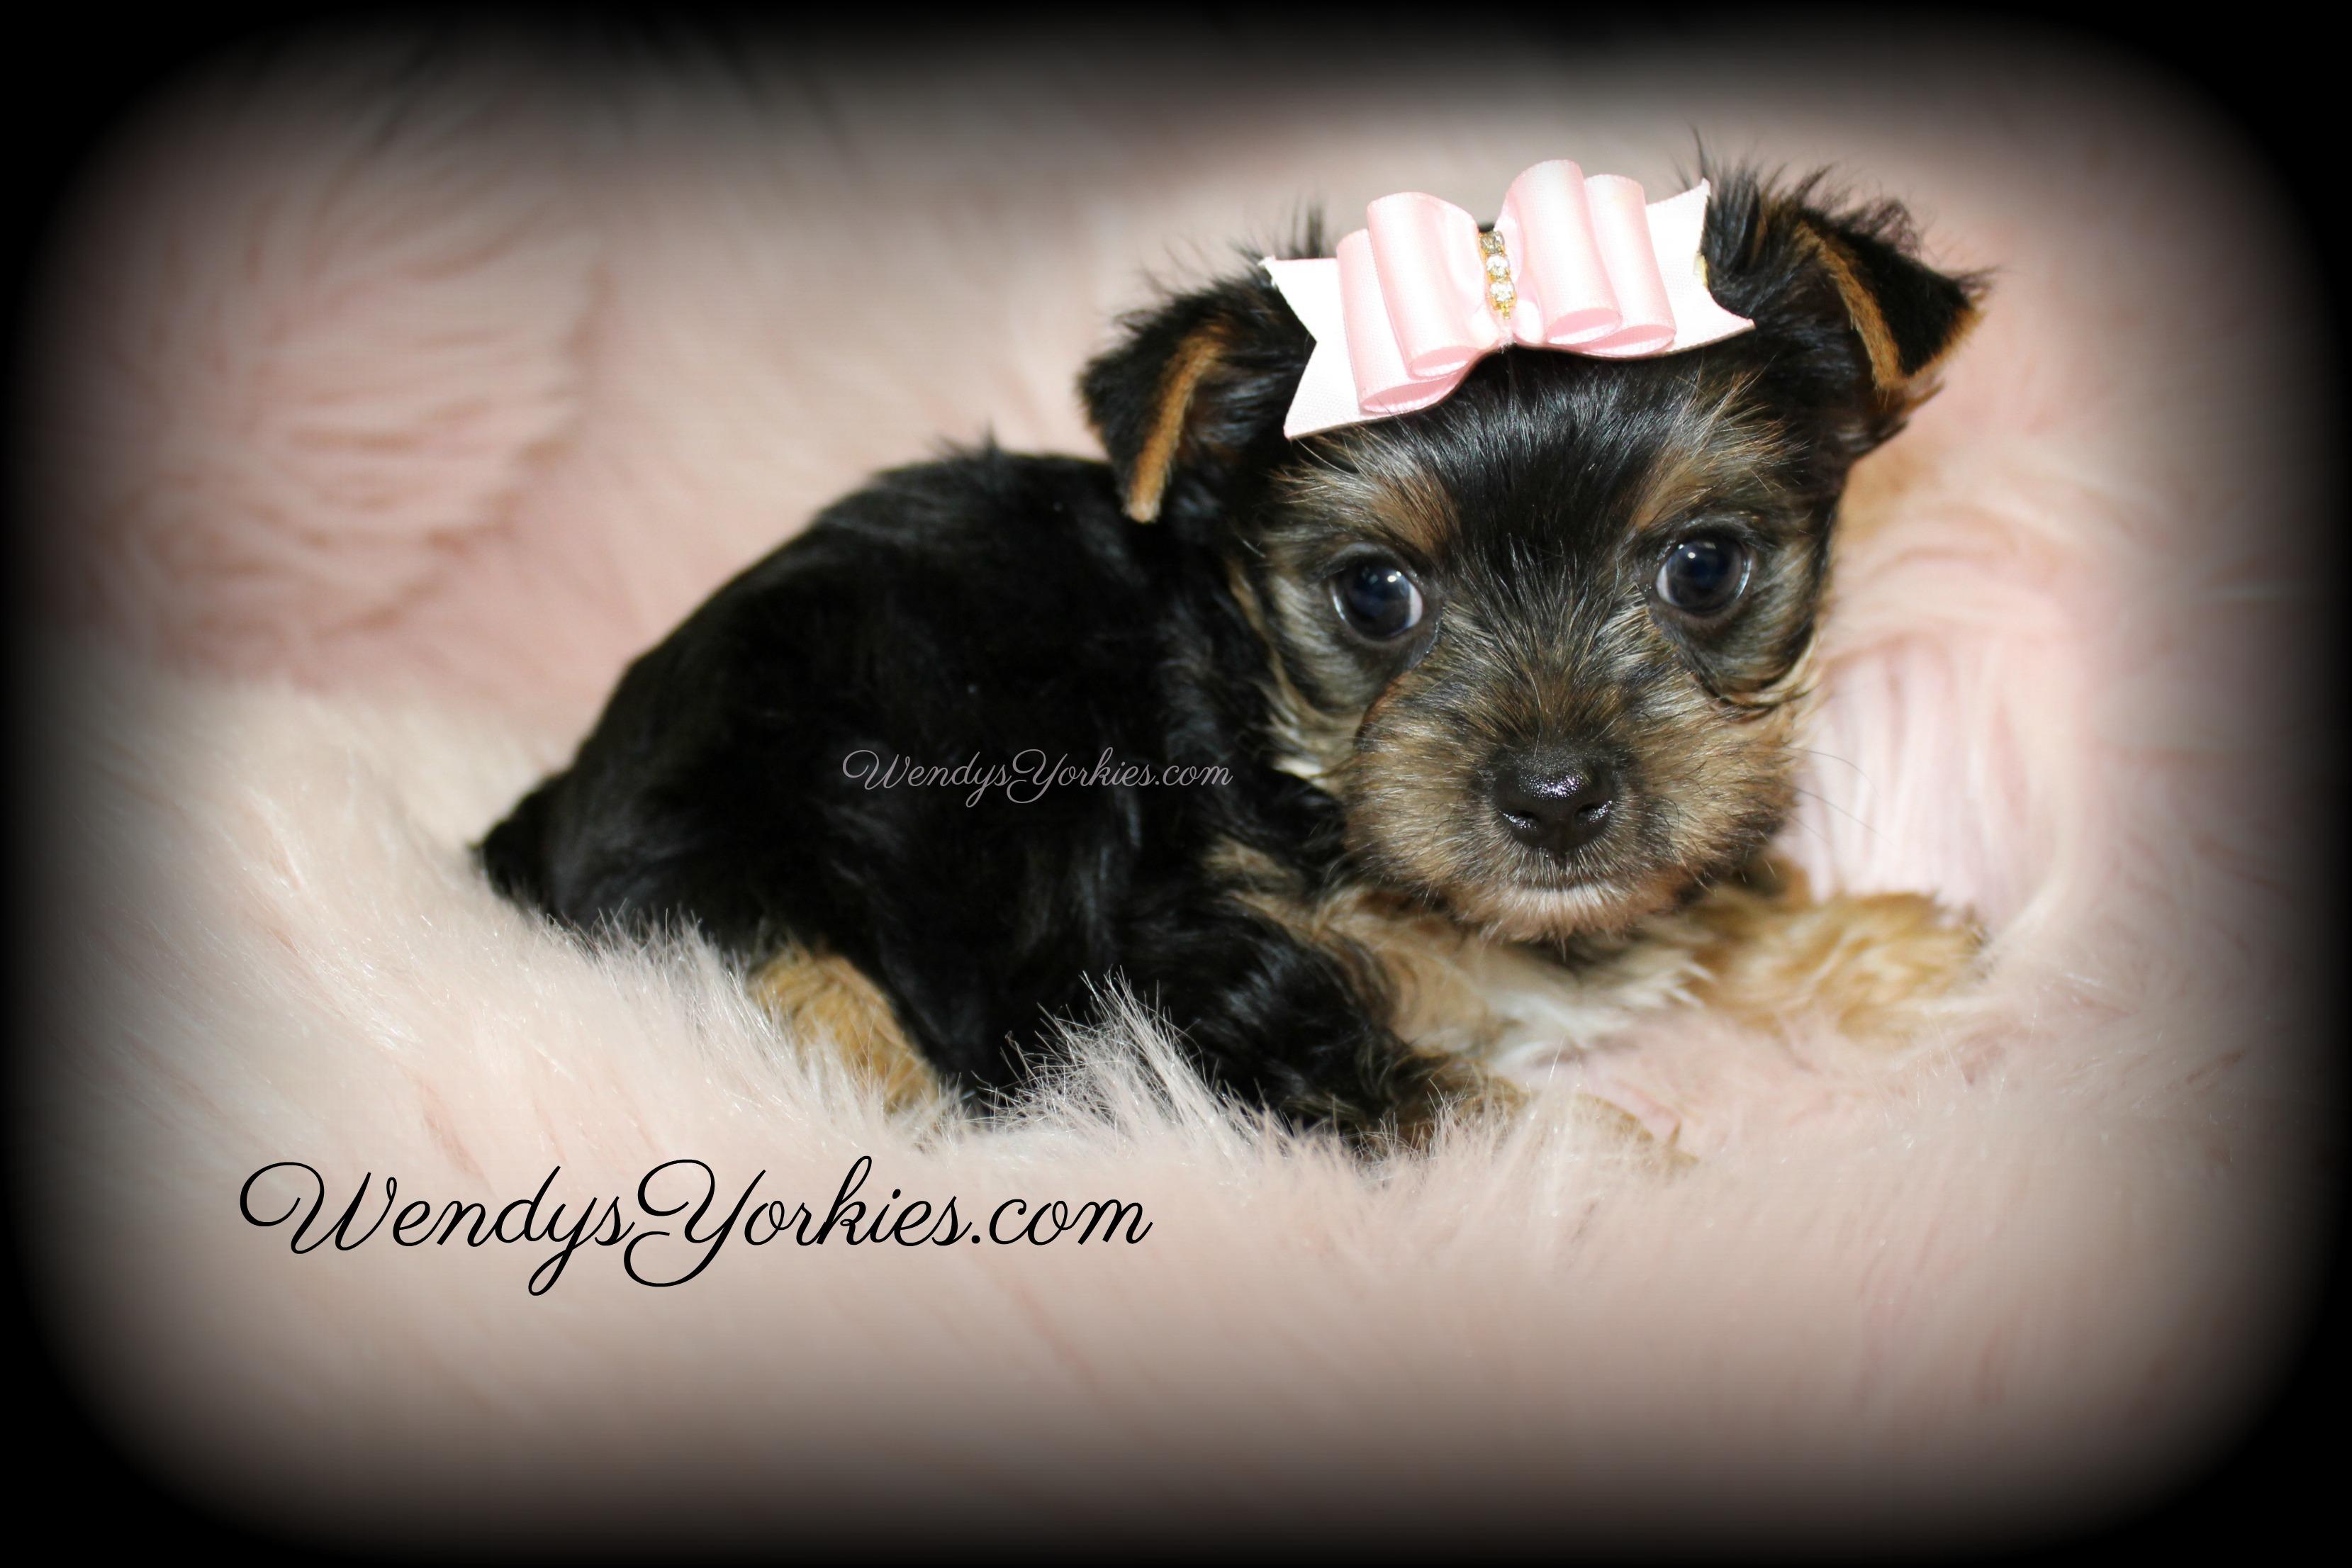 Teacup Yorkie puppies for sale, WendysYorkies.com, Lou lou f1